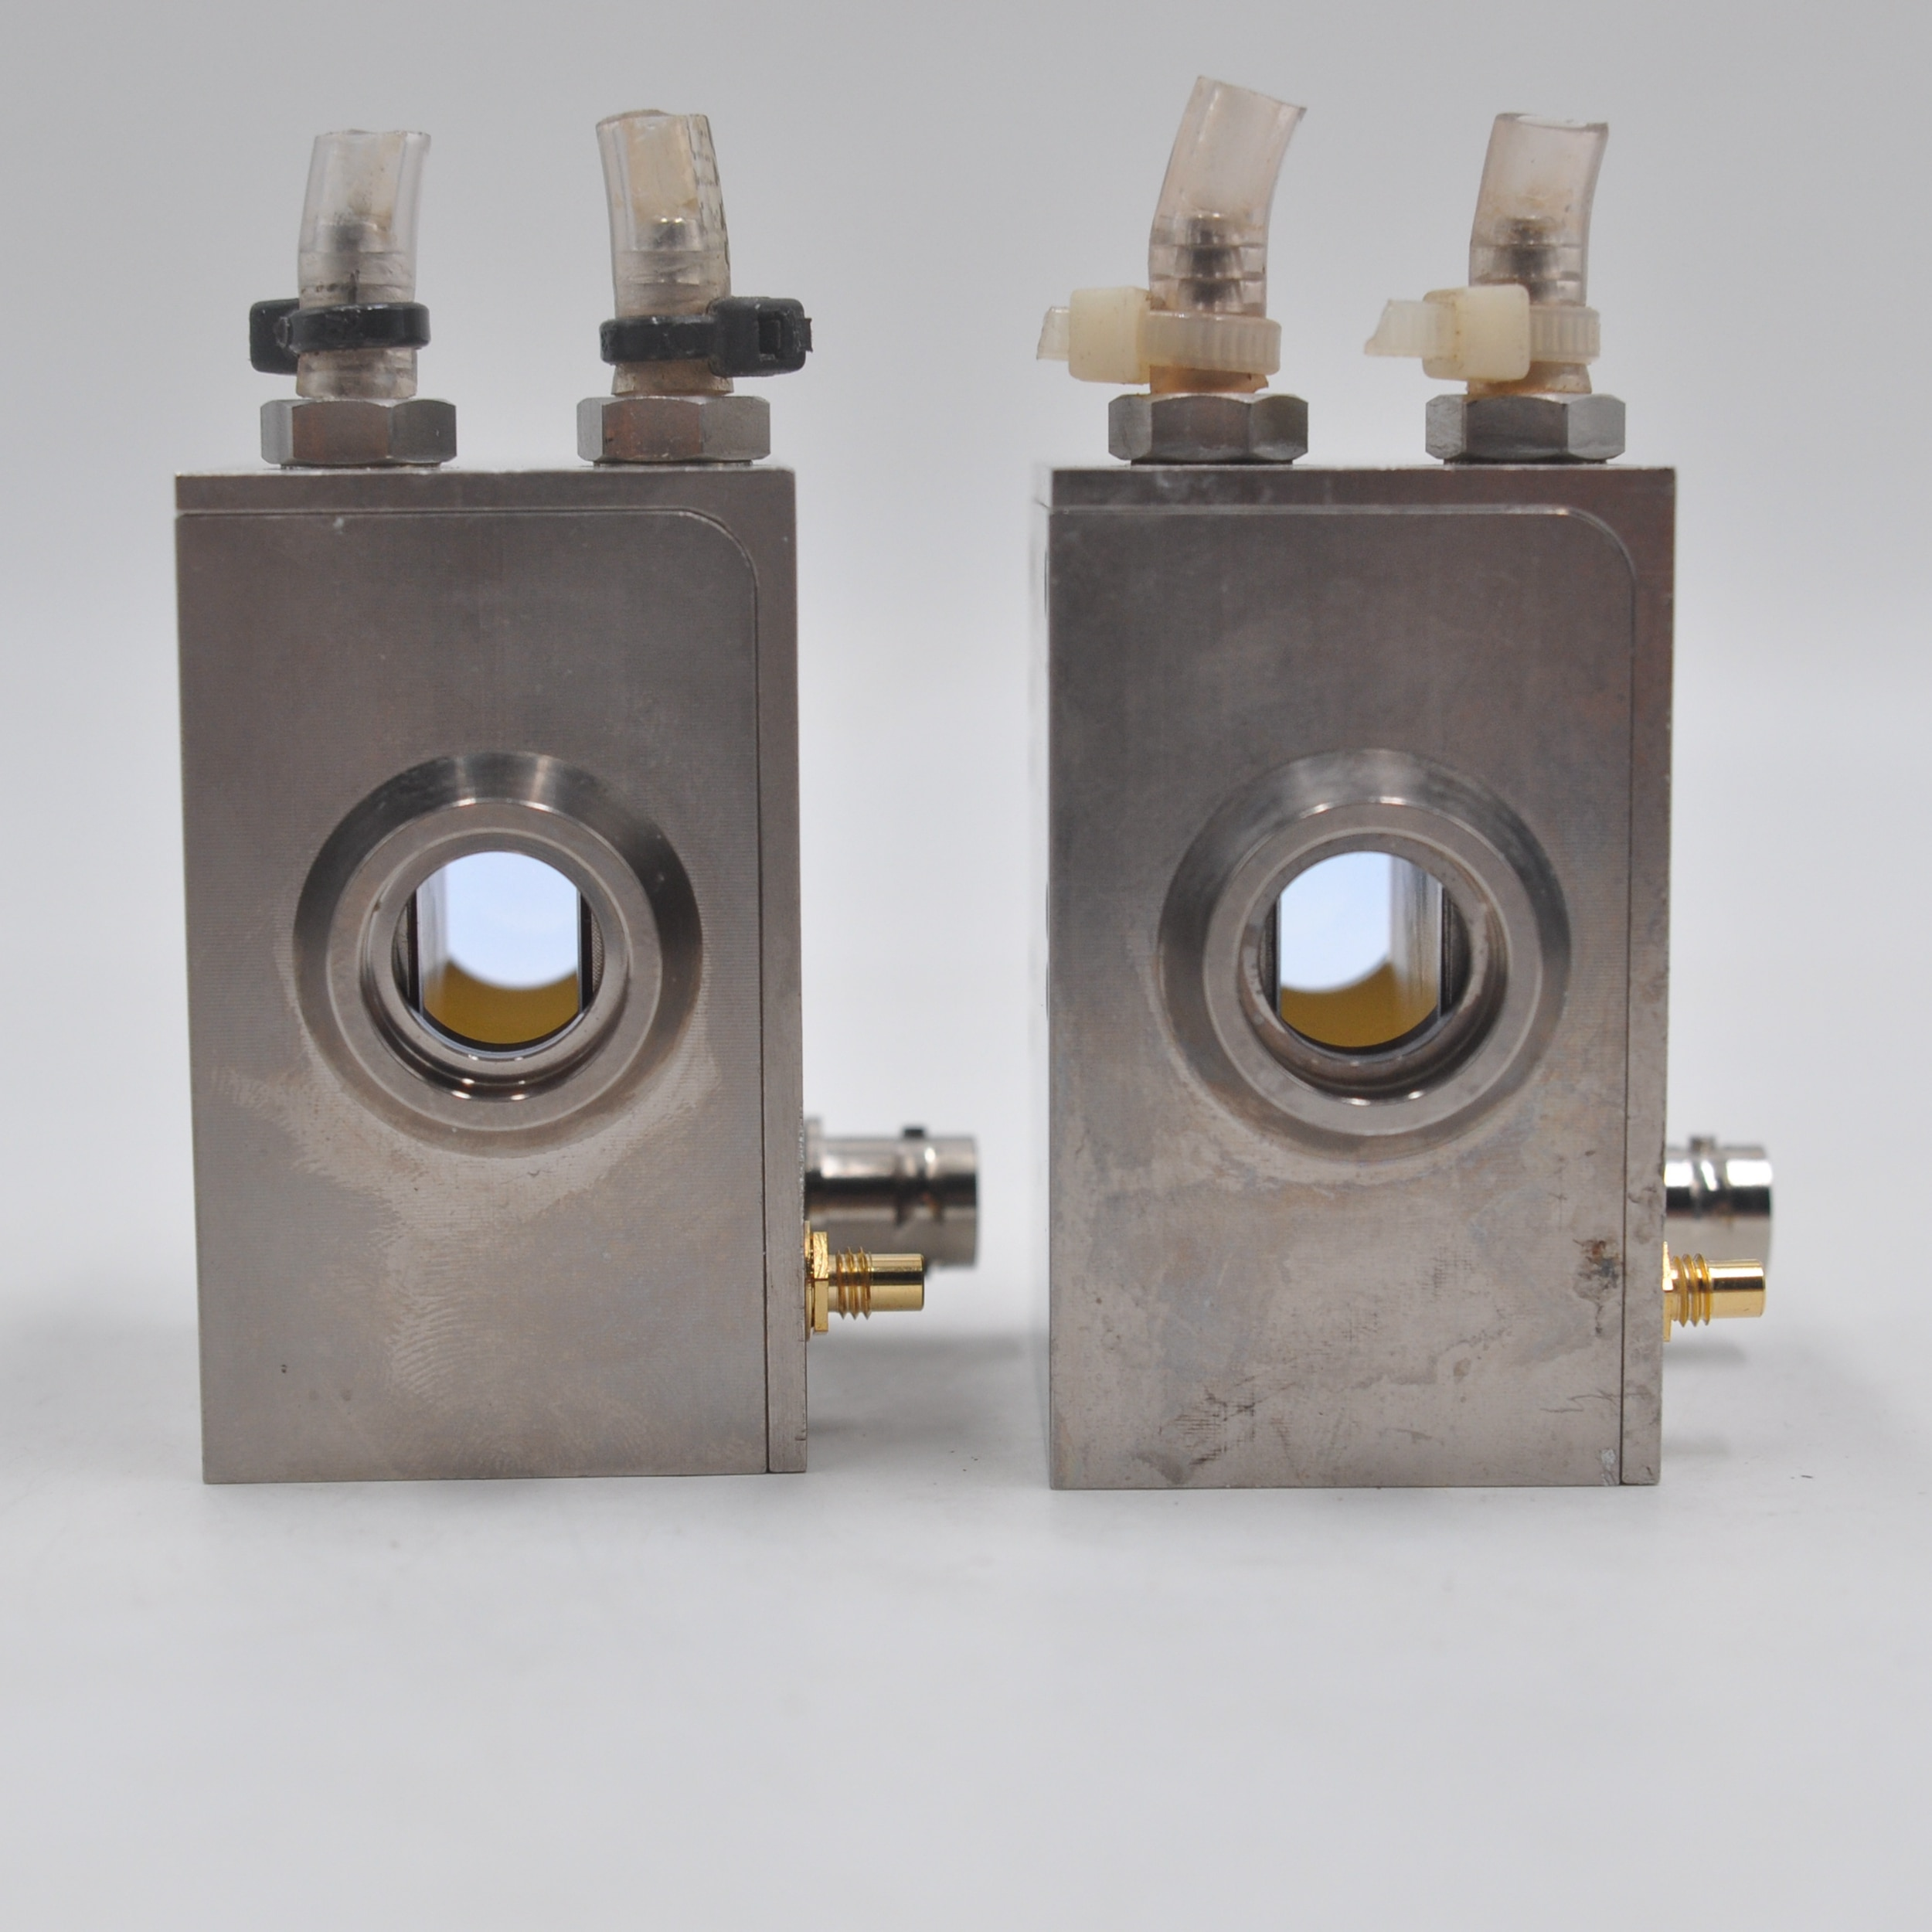 Gooch & Housego Q switch I-QS027-4S4G-B5-RS5 laser marking machine enlarge